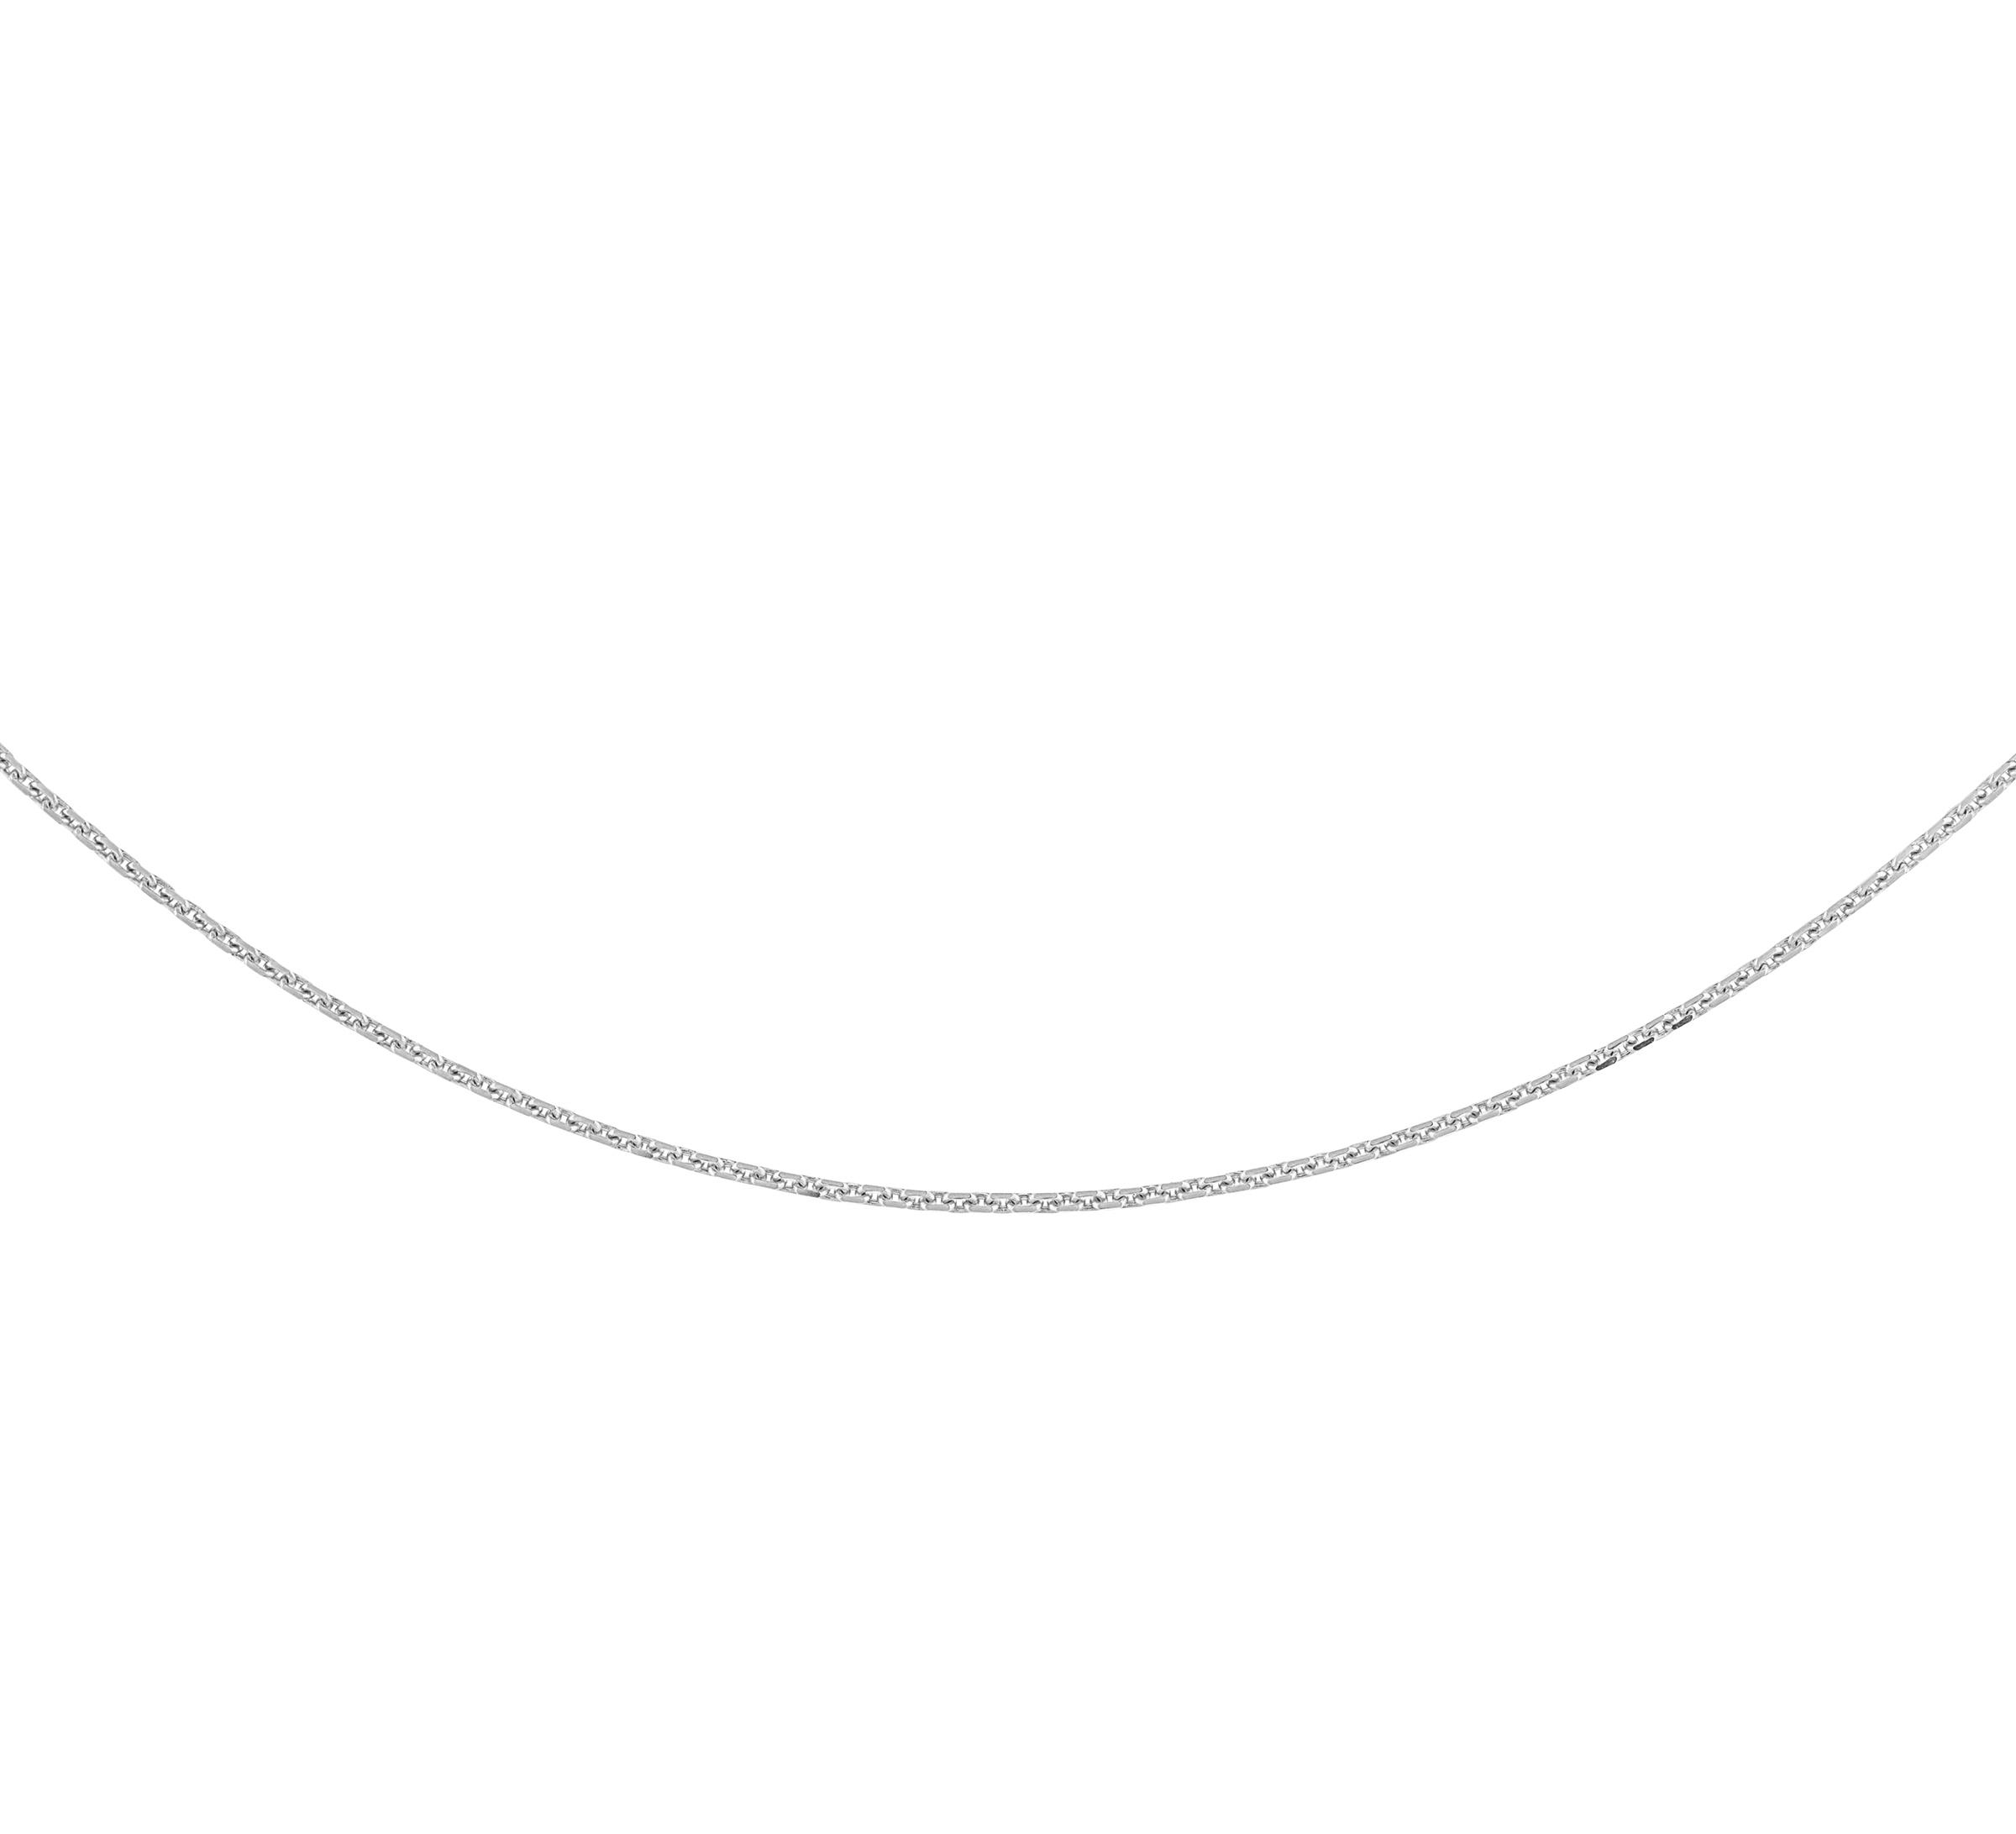 16'' Links style chain for women - 10K white Gold